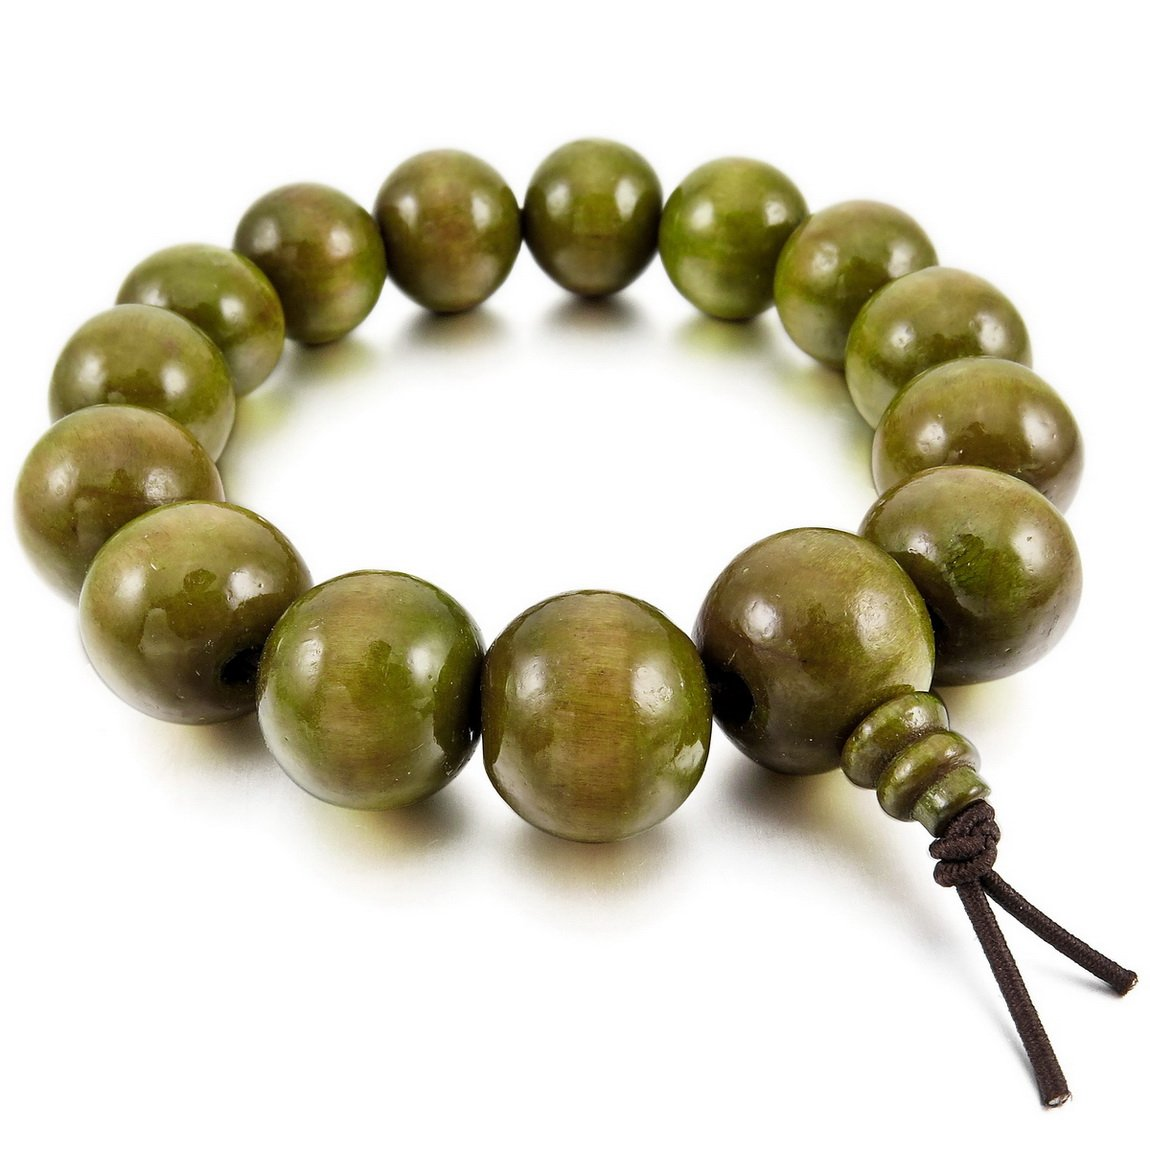 INBLUE Men,Women's 15mm Wood Bracelet Link Wrist Tibetan Buddhist Green Bead Prayer Buddha Mala Chinese knot Elastic